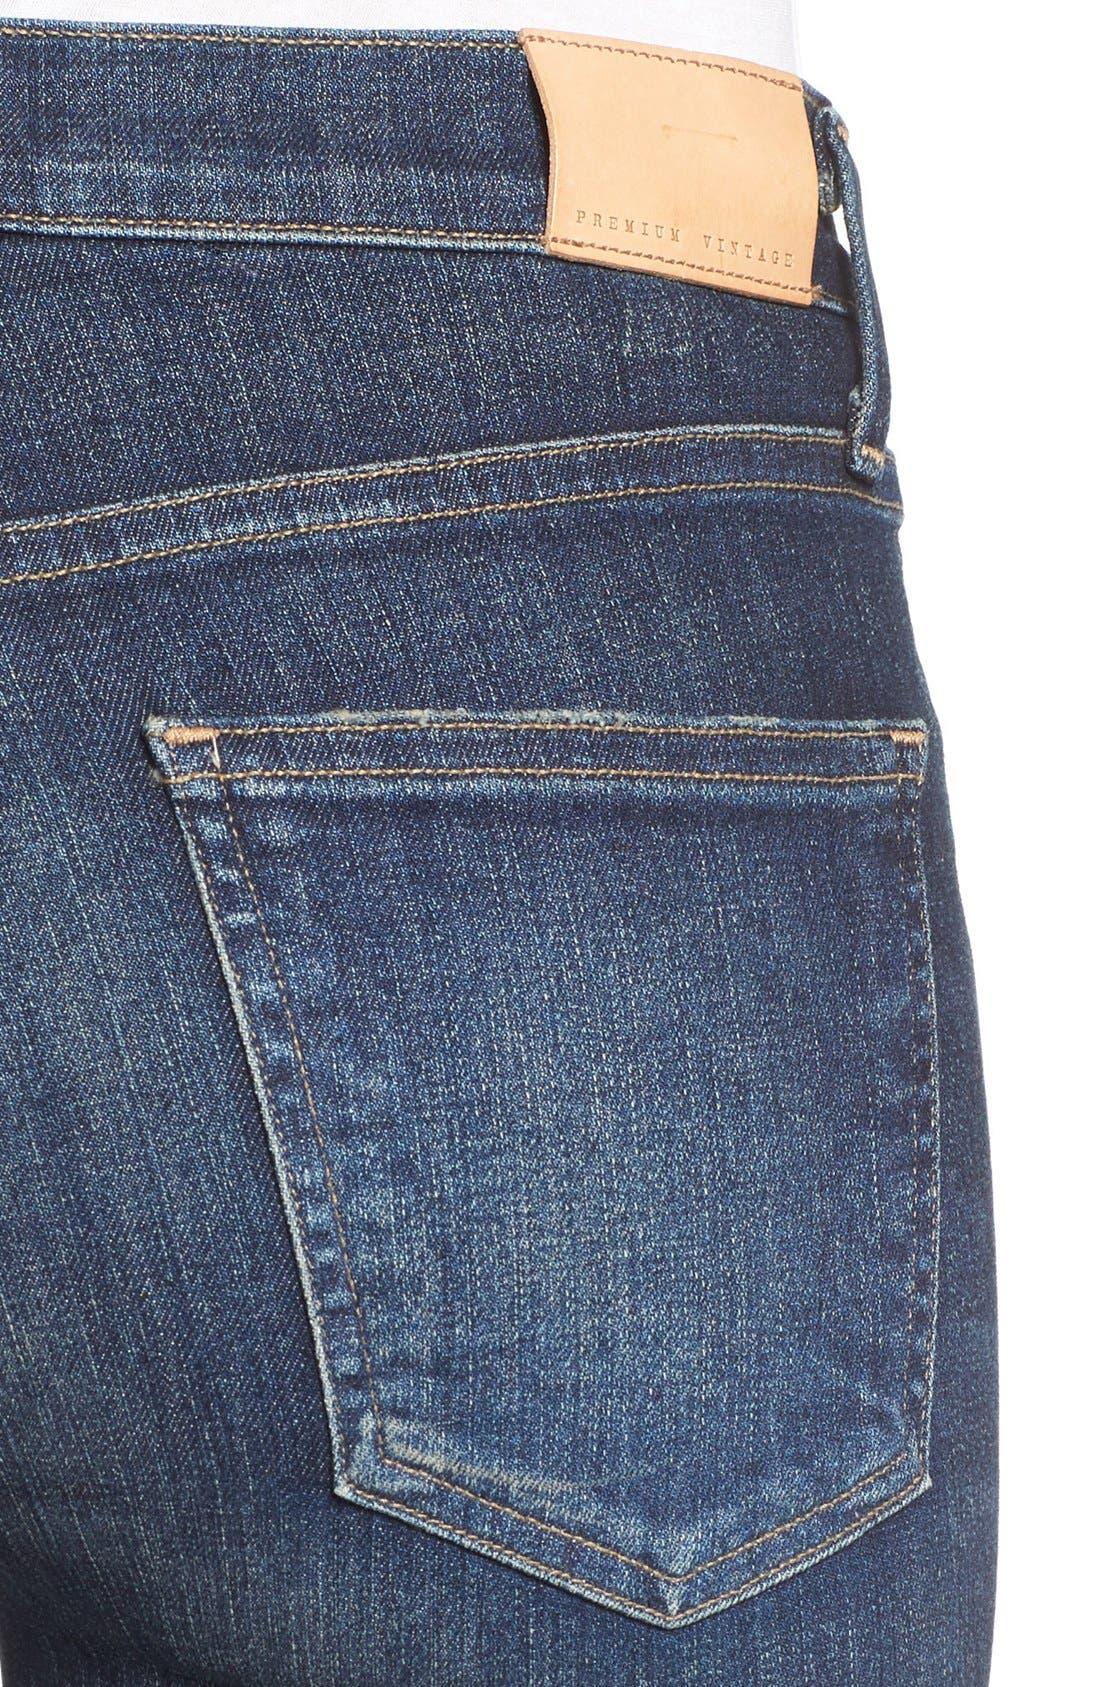 Rocket High Waist Crop Skinny Jeans,                             Alternate thumbnail 5, color,                             410